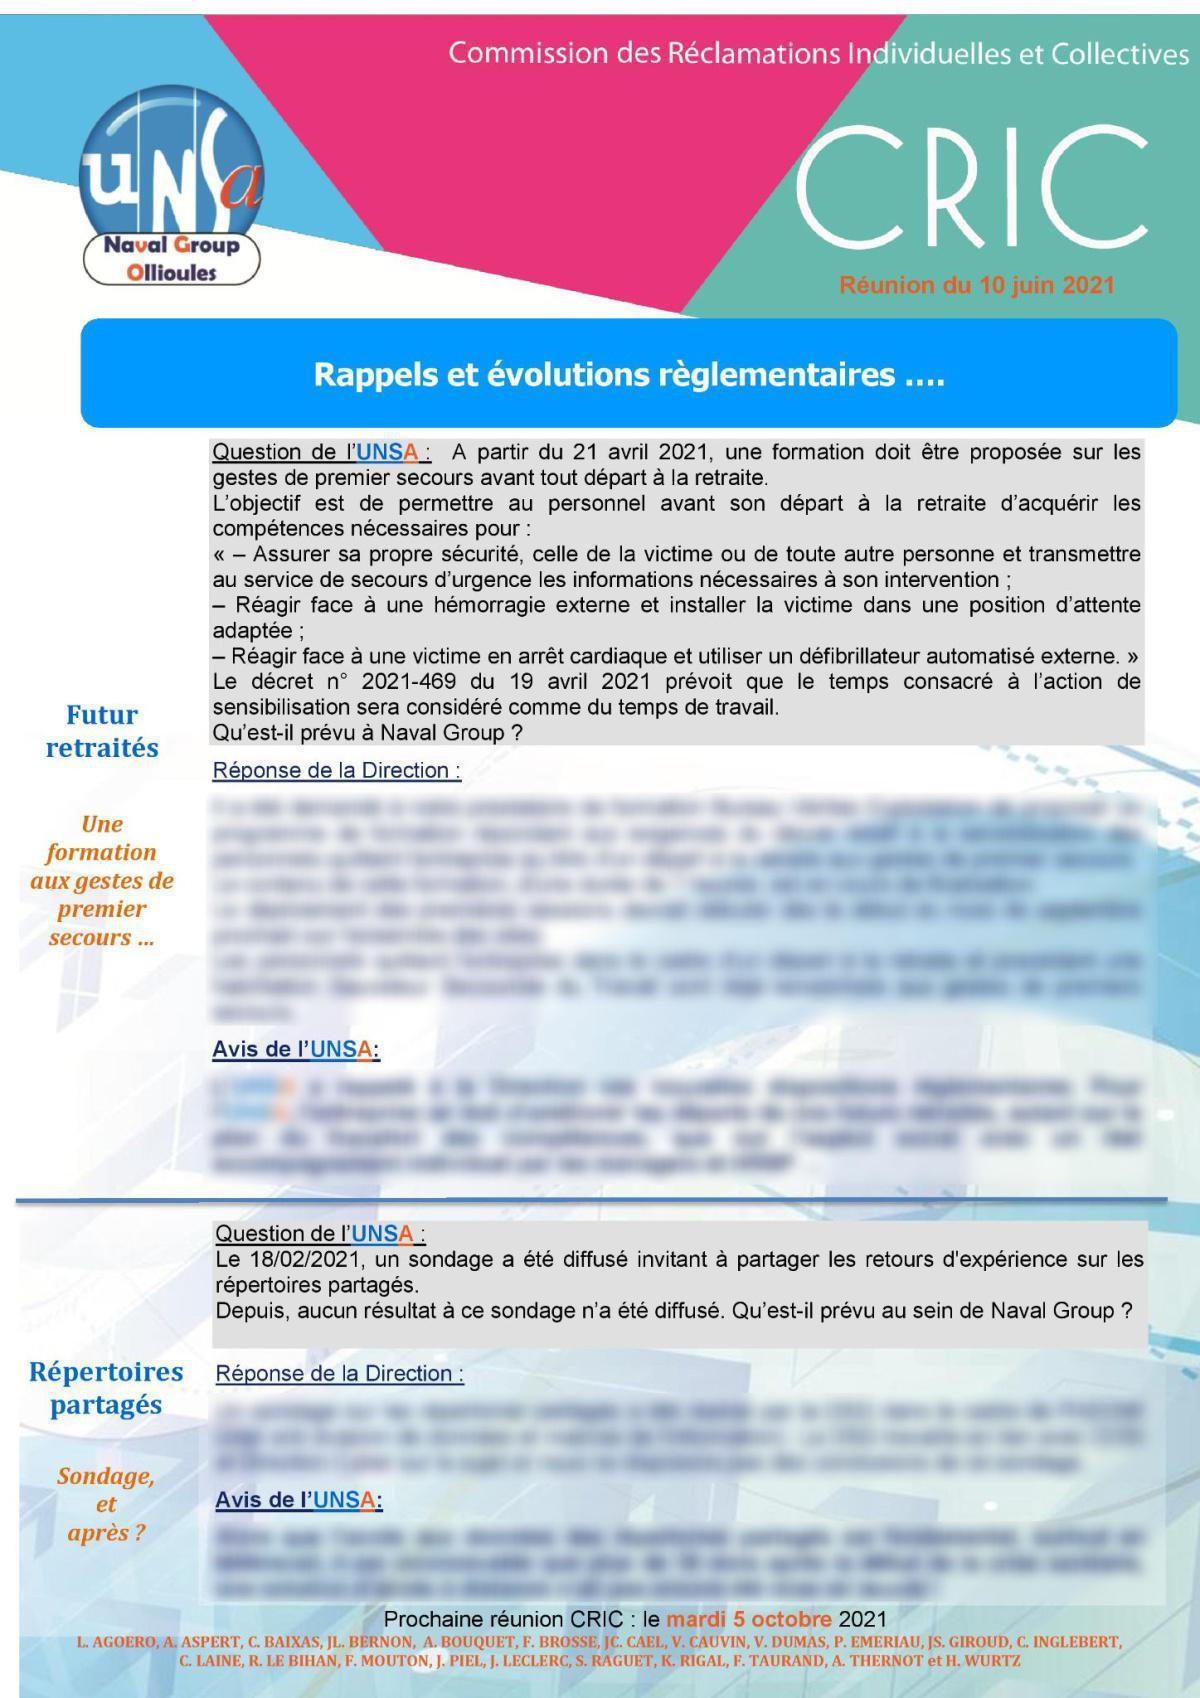 CRIC Ollioules - réunion du 10 juin 2021